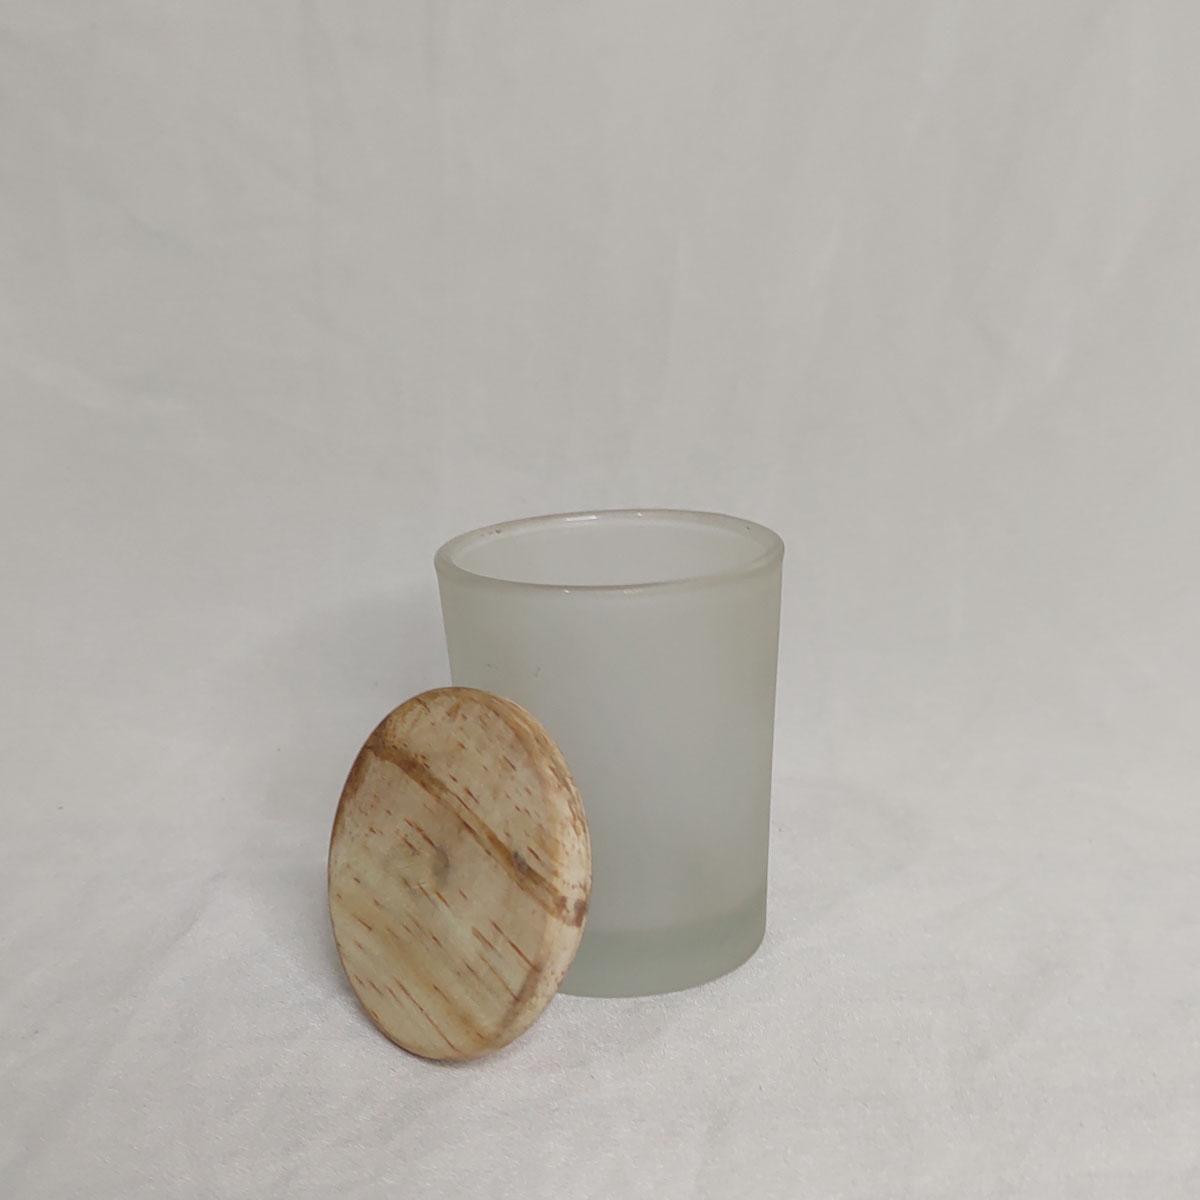 Copo de Vidro Para Vela 70 ml Jateado C/ Tampa de Madeira - 6 unidades